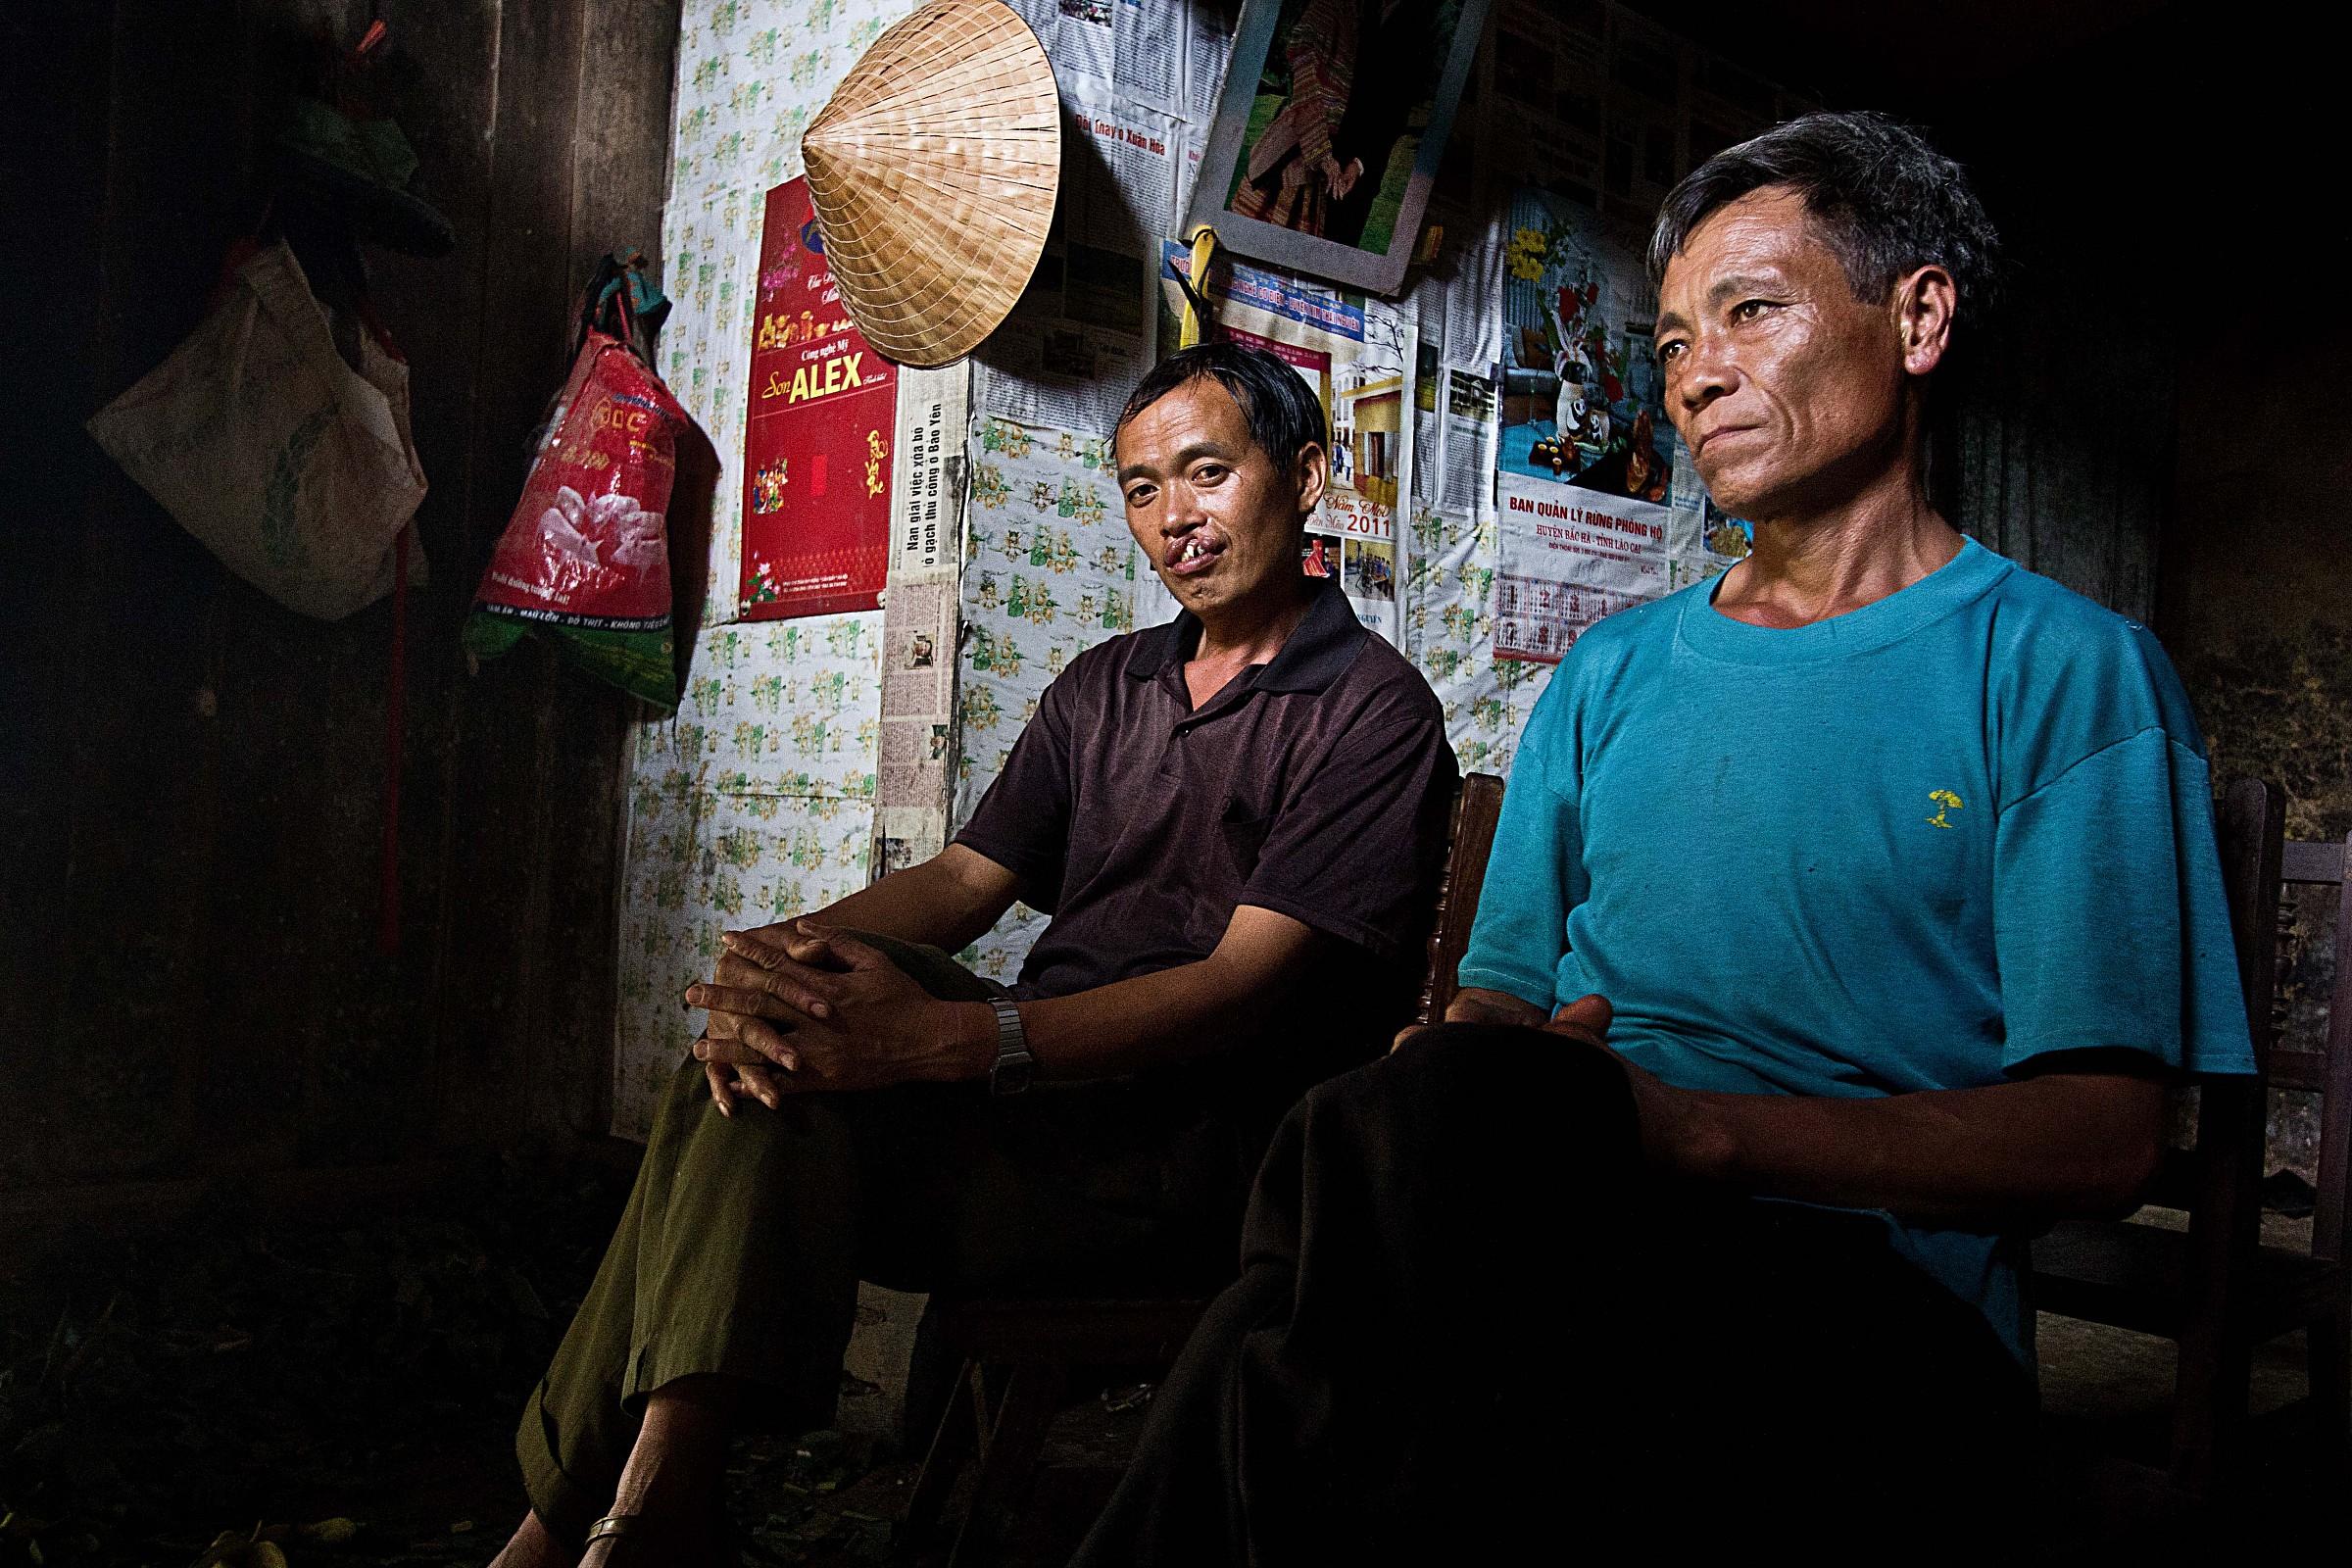 interno di una casa vietnamita.....